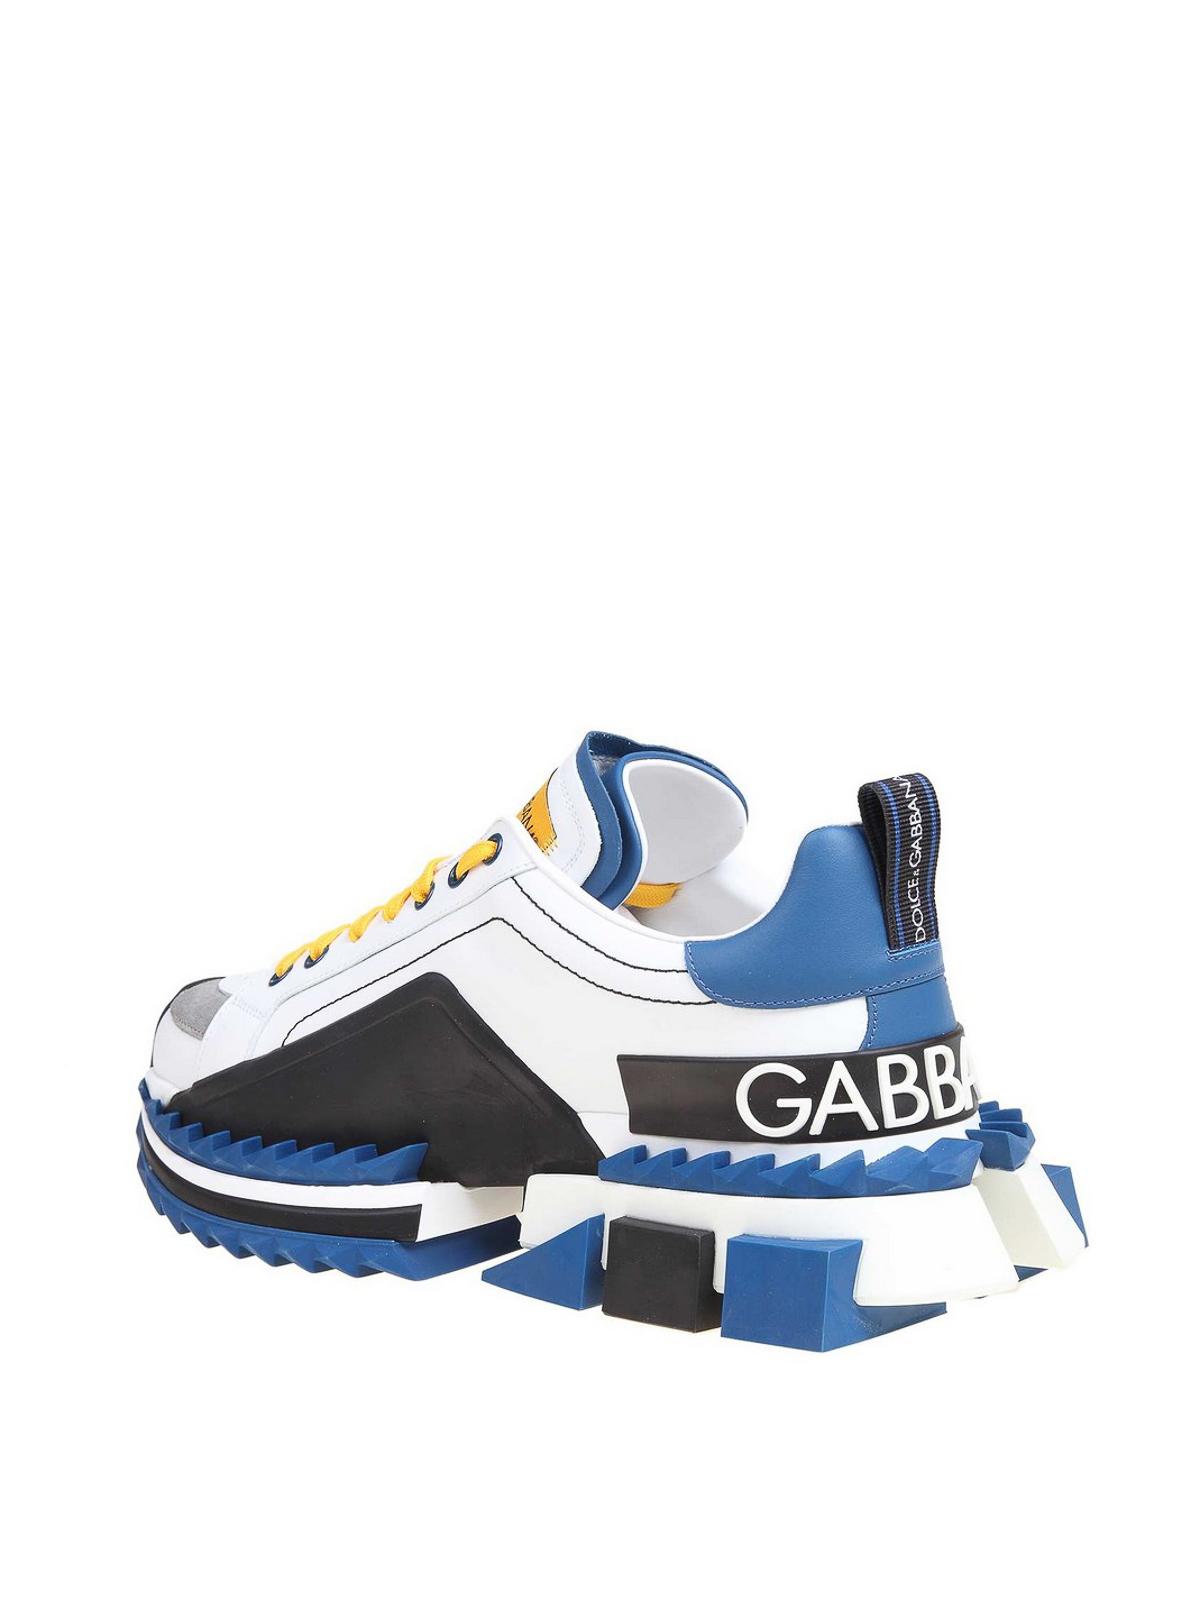 King sneakers - trainers - CS1649AZ69289951